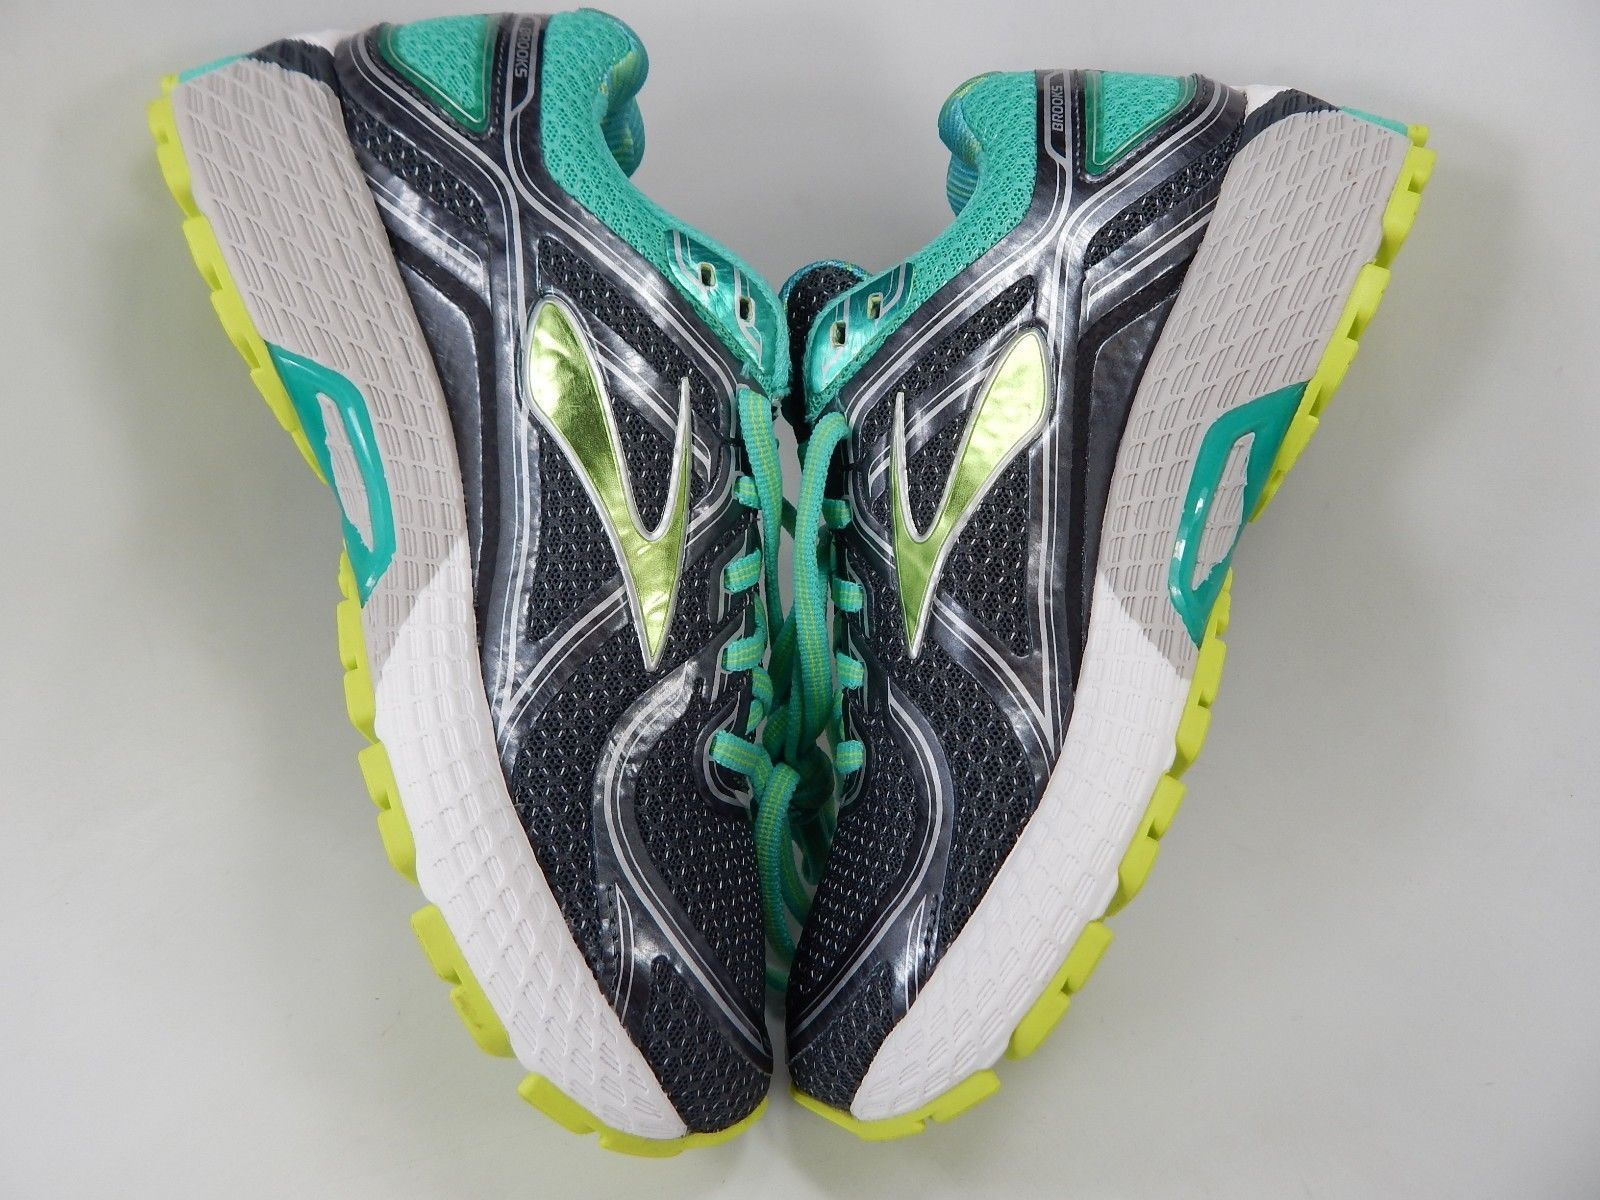 MISMATCH Brooks GTS 16 Sz 6.5 M (B) Left & 5.5 M (B) Right Women's Running Shoes